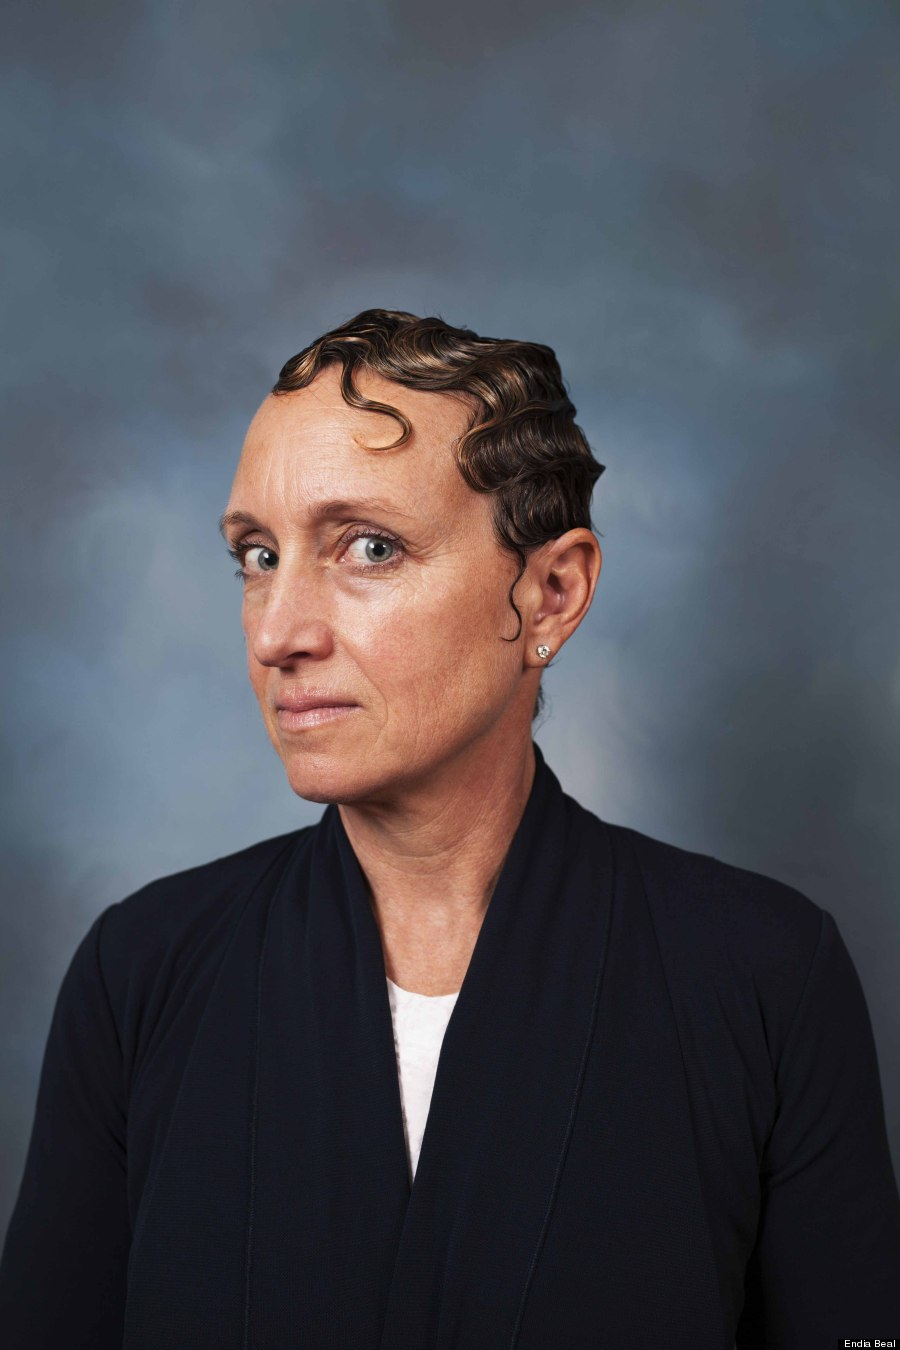 Incredible White Women With Black Hairstyles Redefine Corporate America The Short Hairstyles Gunalazisus